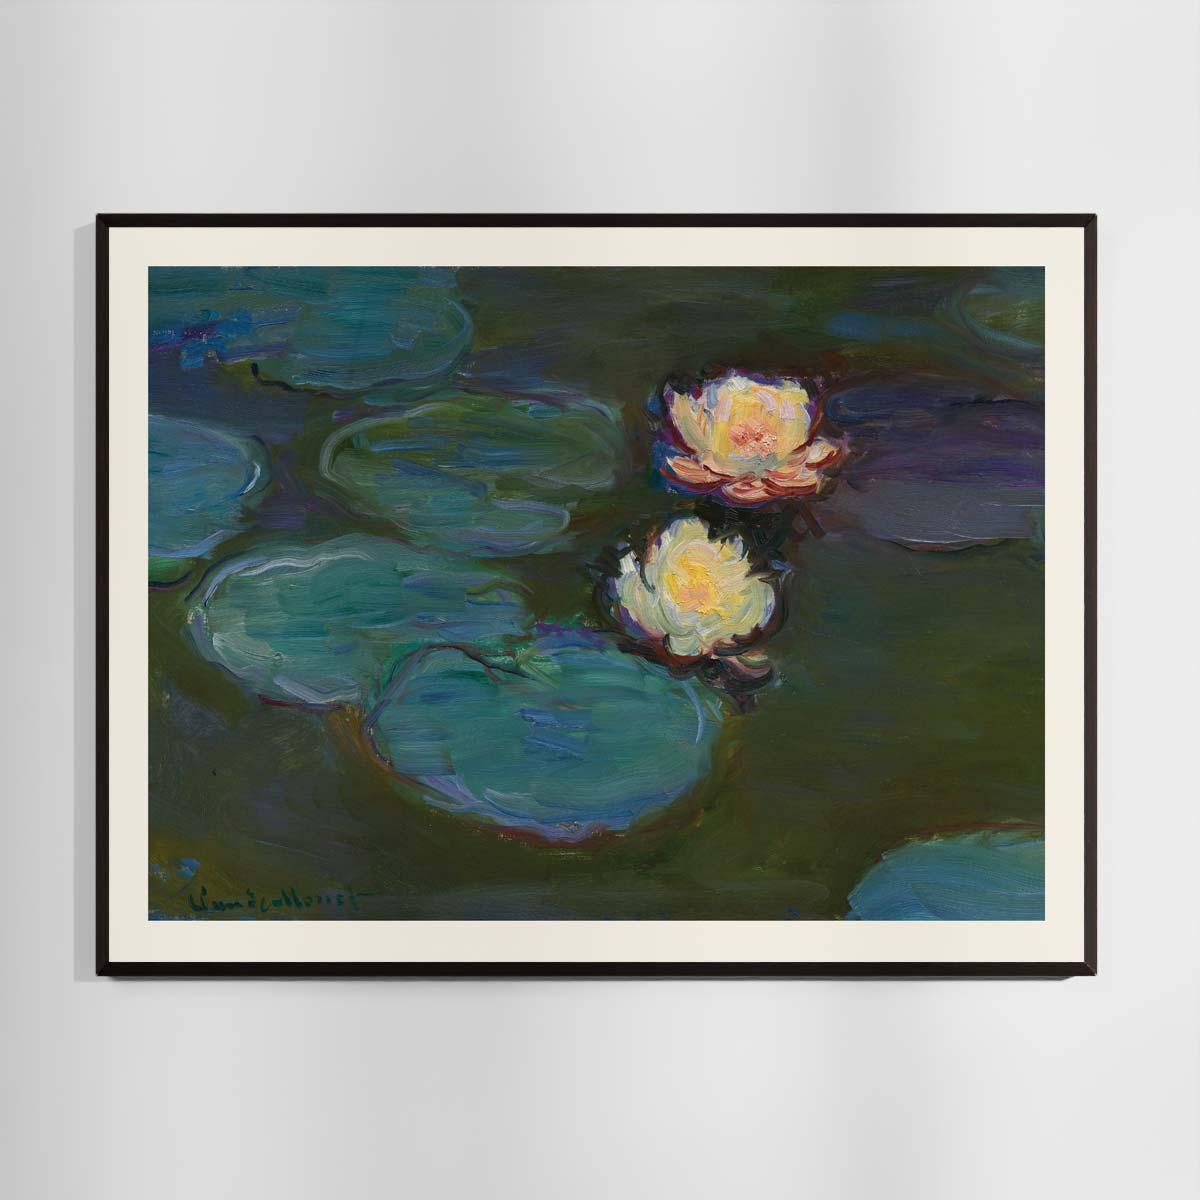 Åkander- Nympheas - Claude Monet plakat